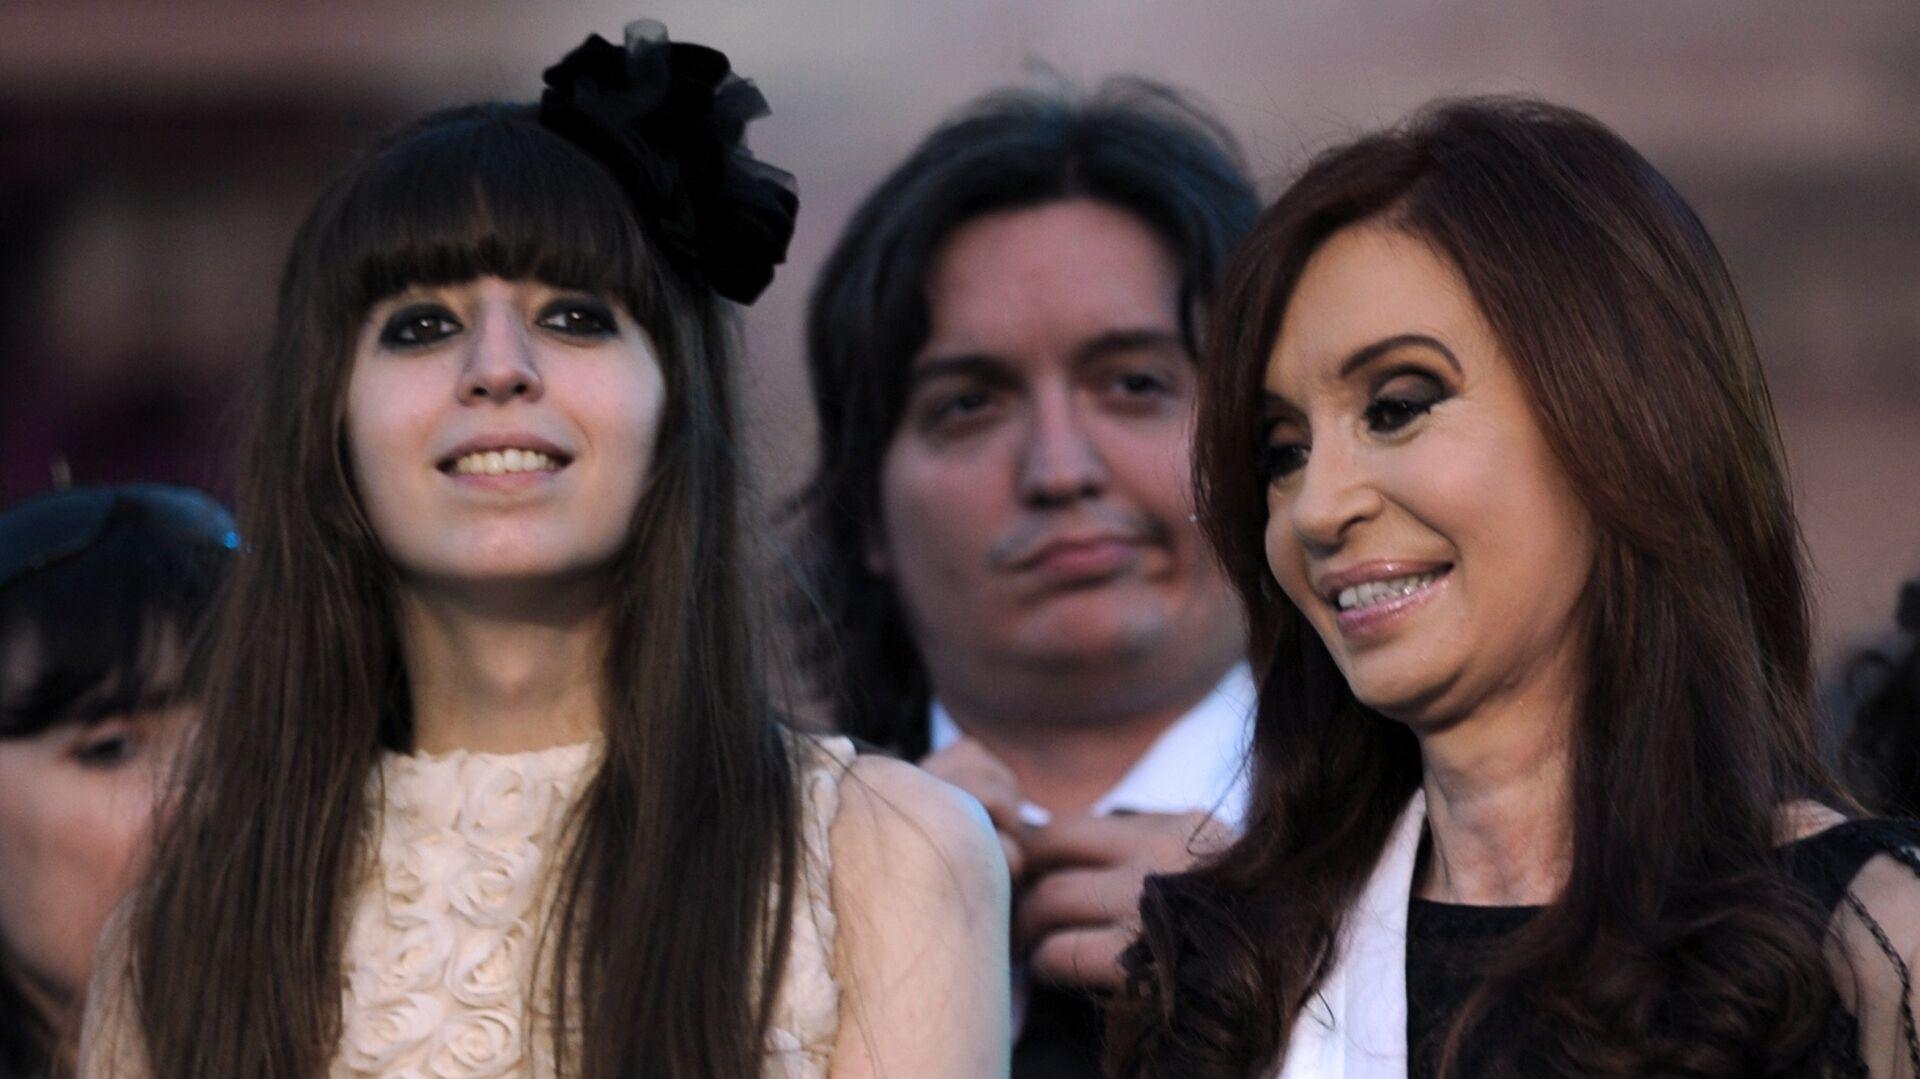 Florencia Kirchner y  Cristina Fernández, expresidenta argentina - Sputnik Mundo, 1920, 10.06.2021